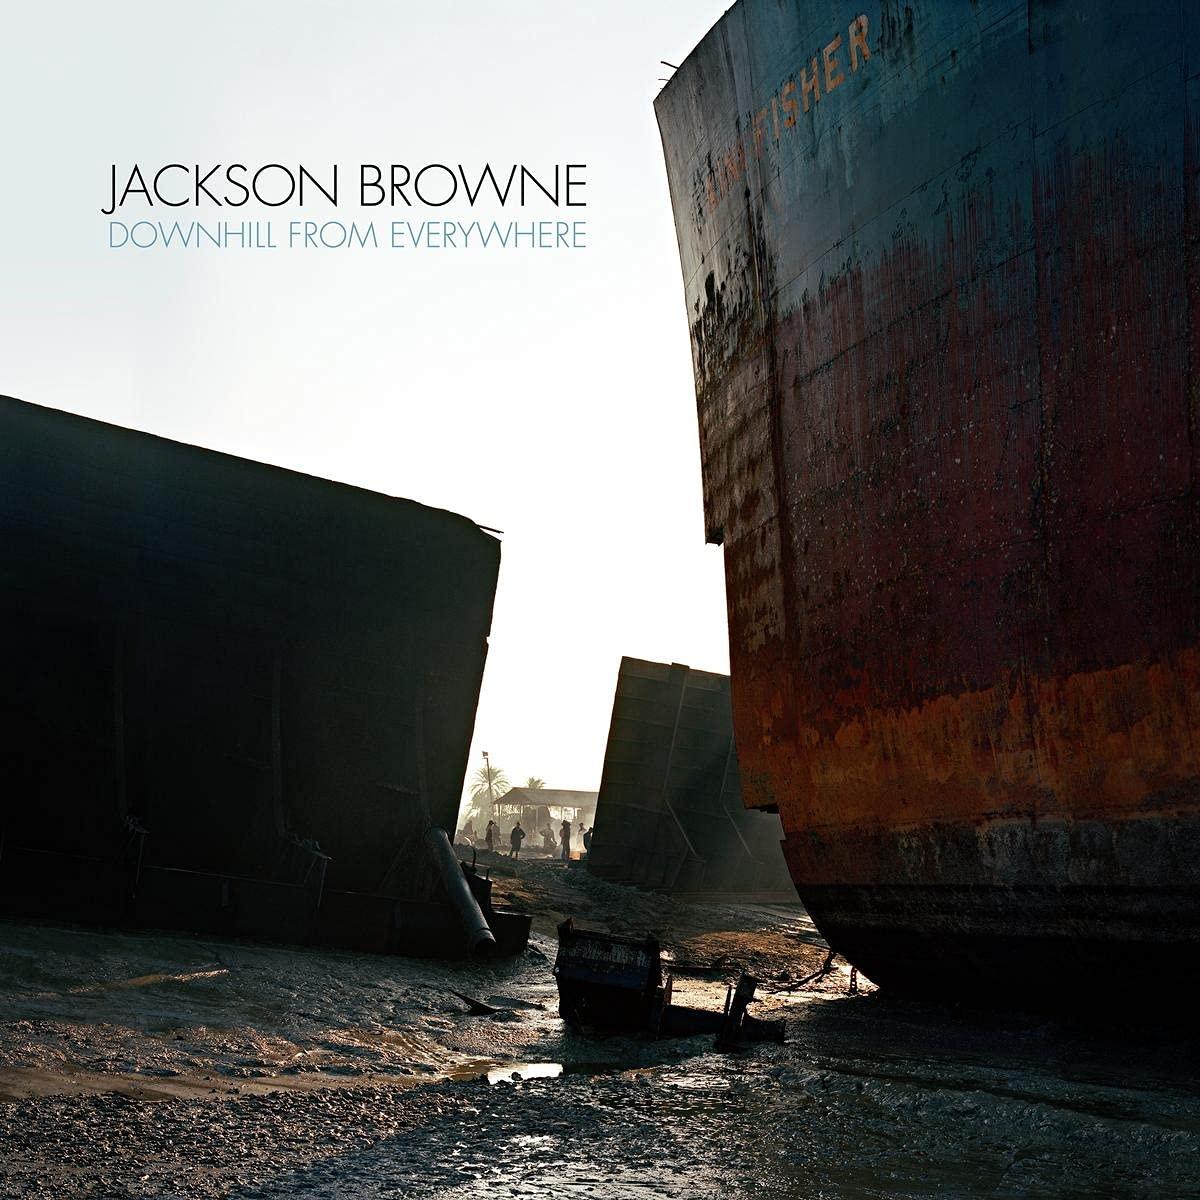 Jackson Browne - Downhill From Everywhere - Amazon.com Music